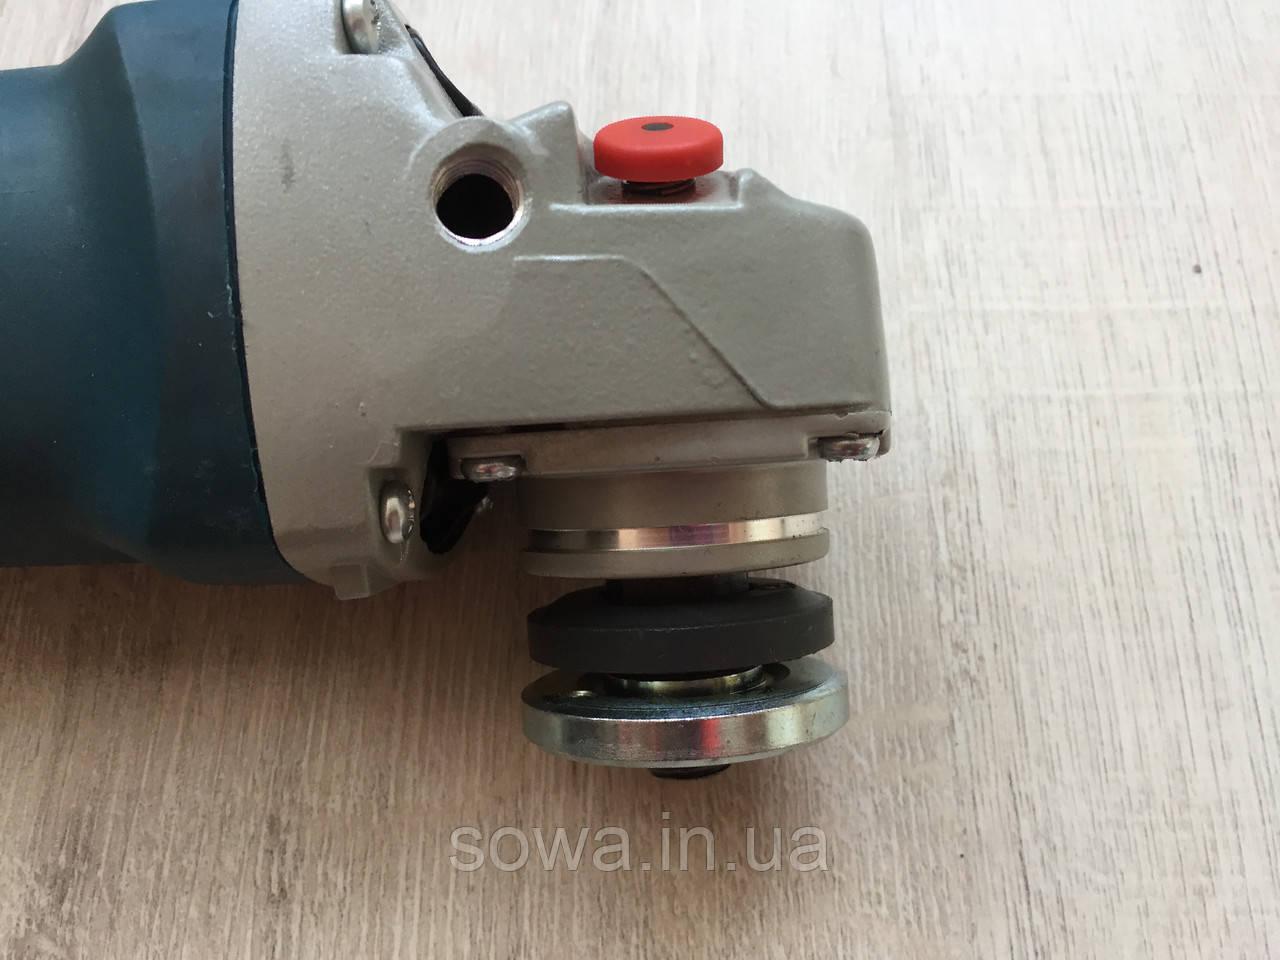 Болгарка BOSCH_ БОШ GWS1400 ( 1400 Вт, 125 мм ) + ПОДАРОК - фото 6